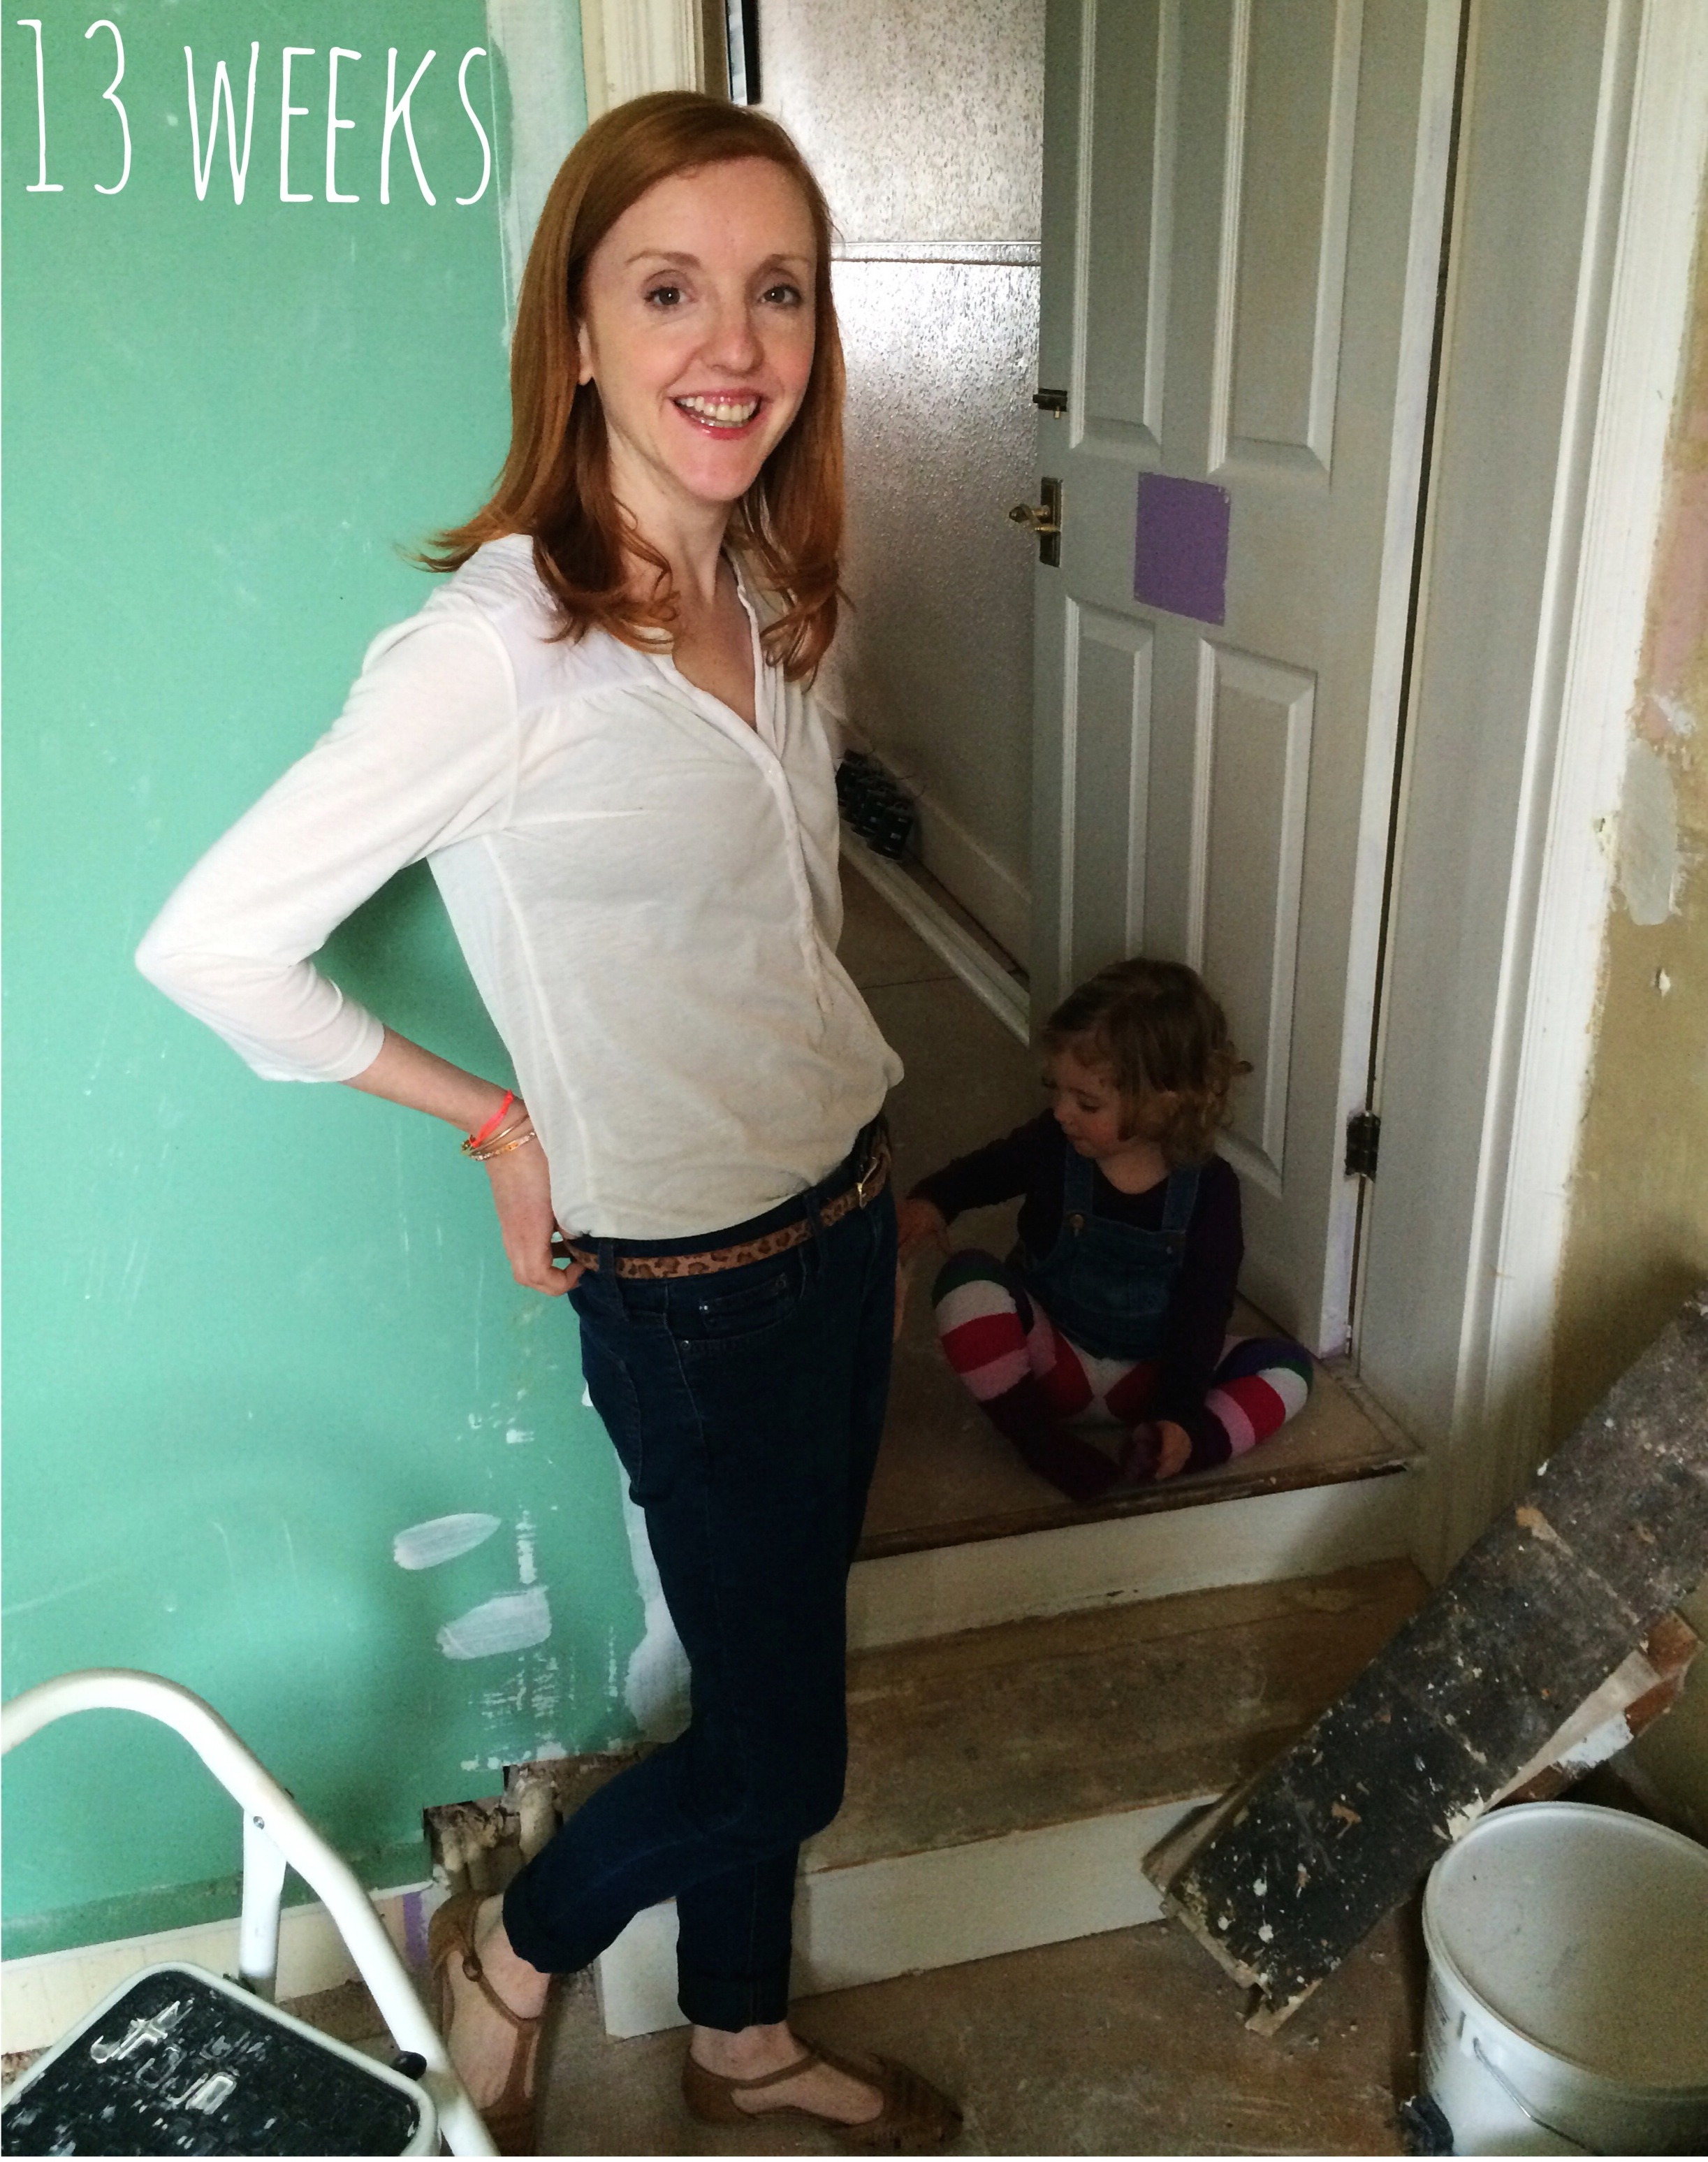 Pregnancy update: first trimester update week 0-13